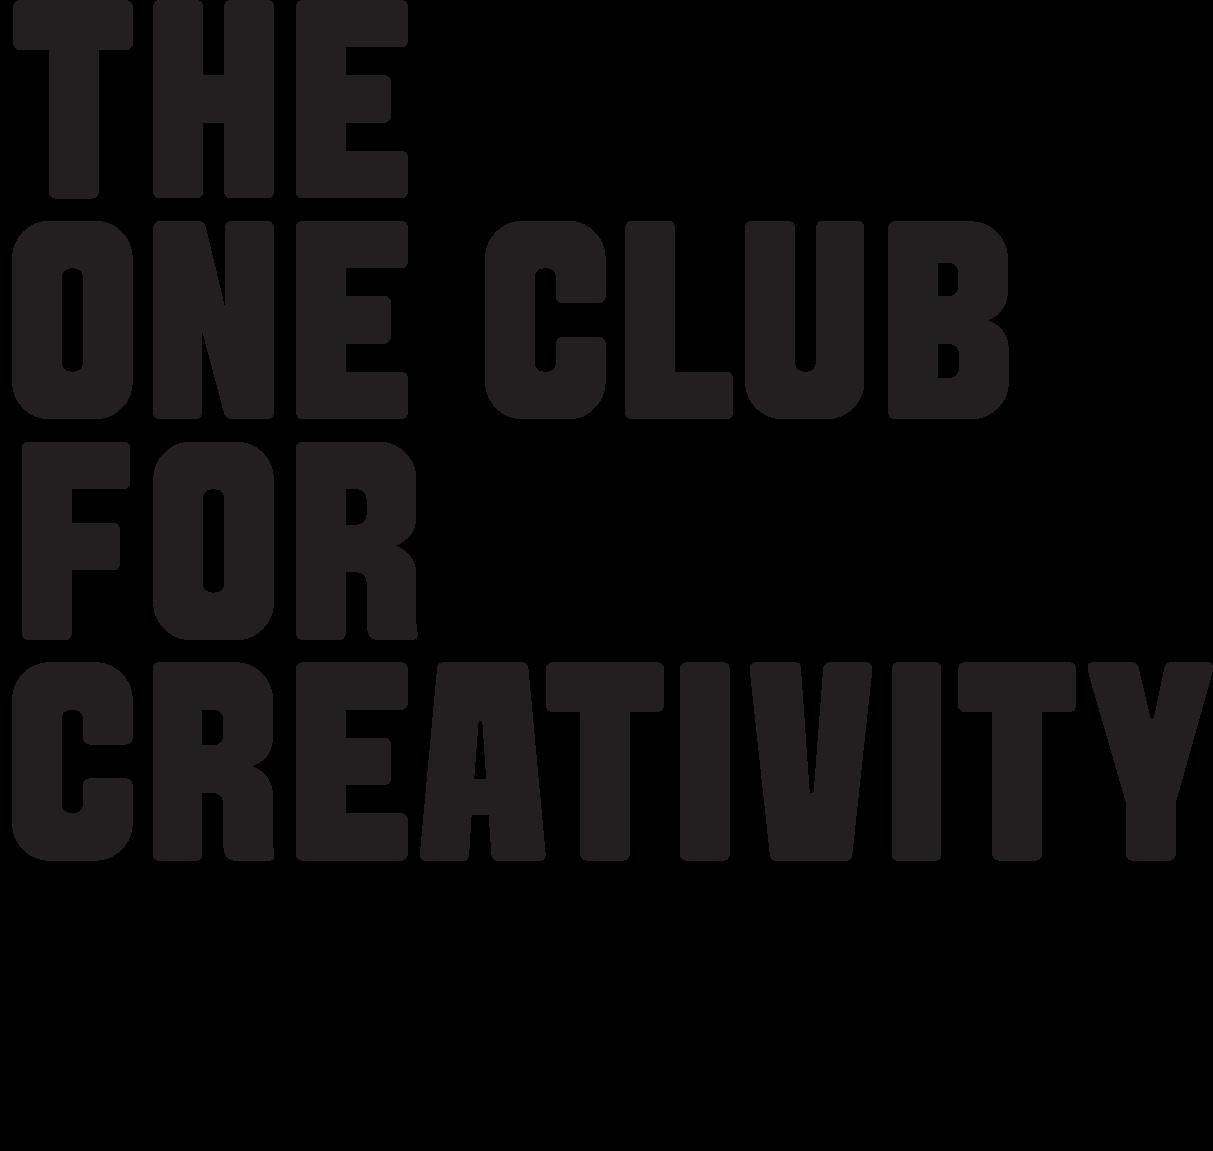 OC_SD-logo_black (4).png